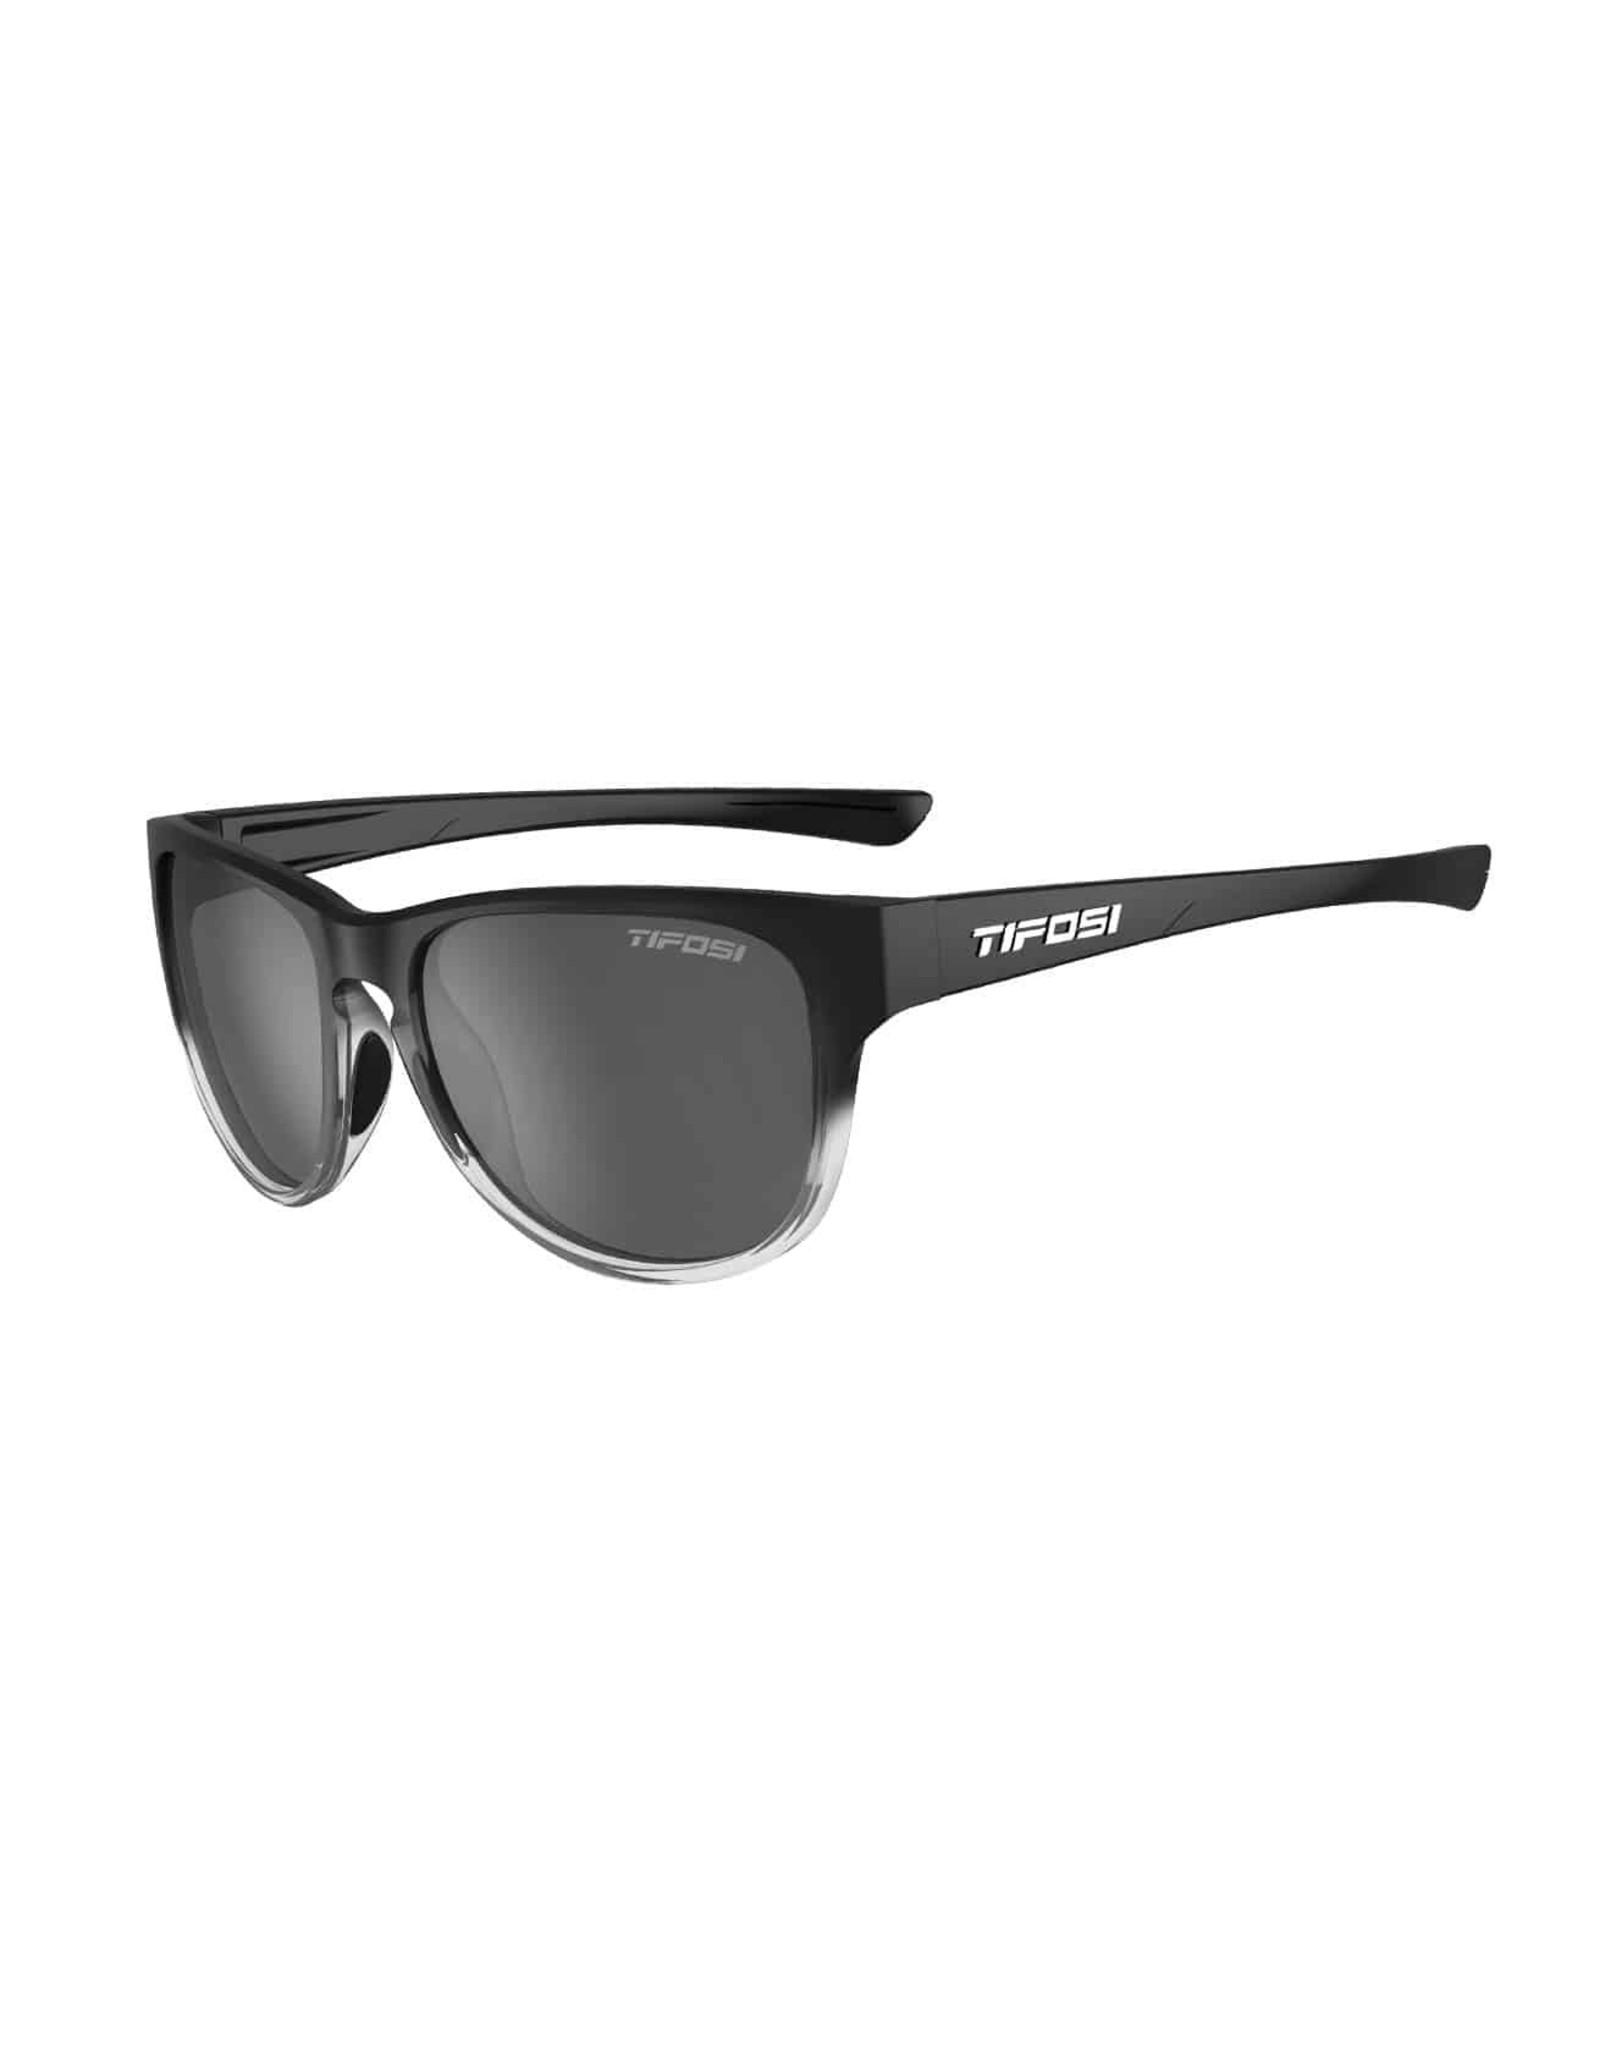 Tifosi Optics Smoove, Onyx Fade Smoke Glasses